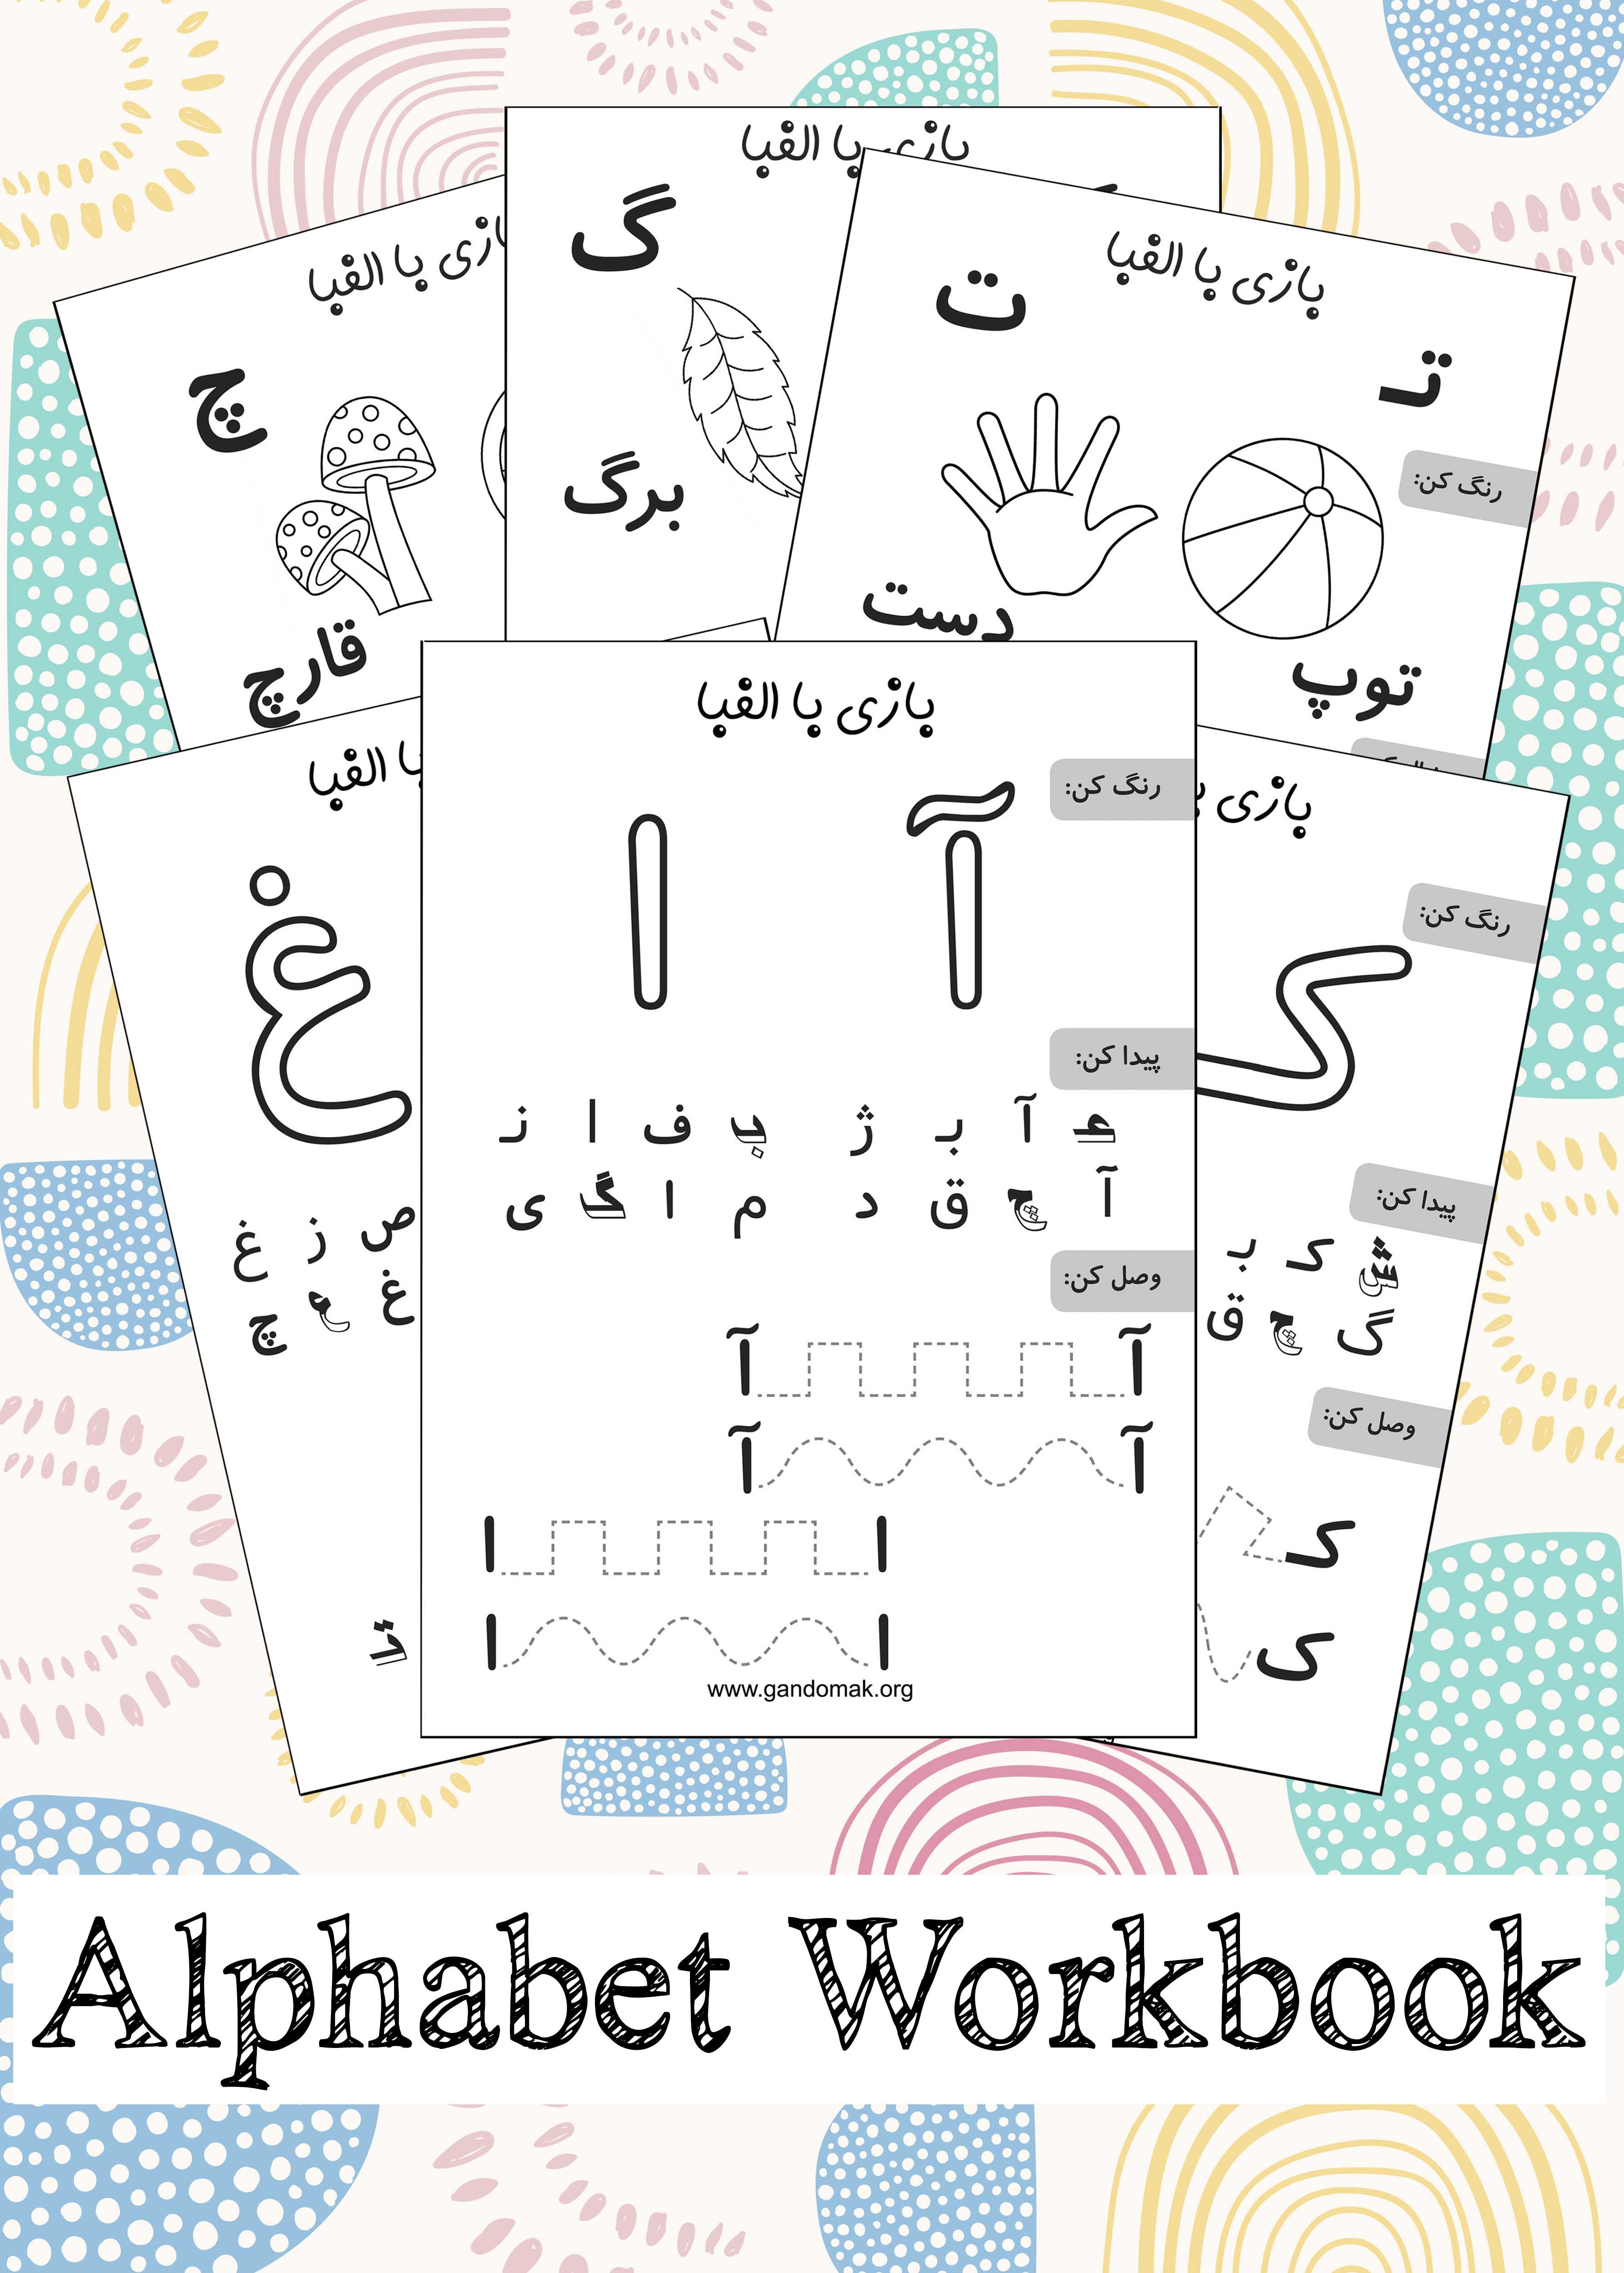 Persian Alphabet Workbook